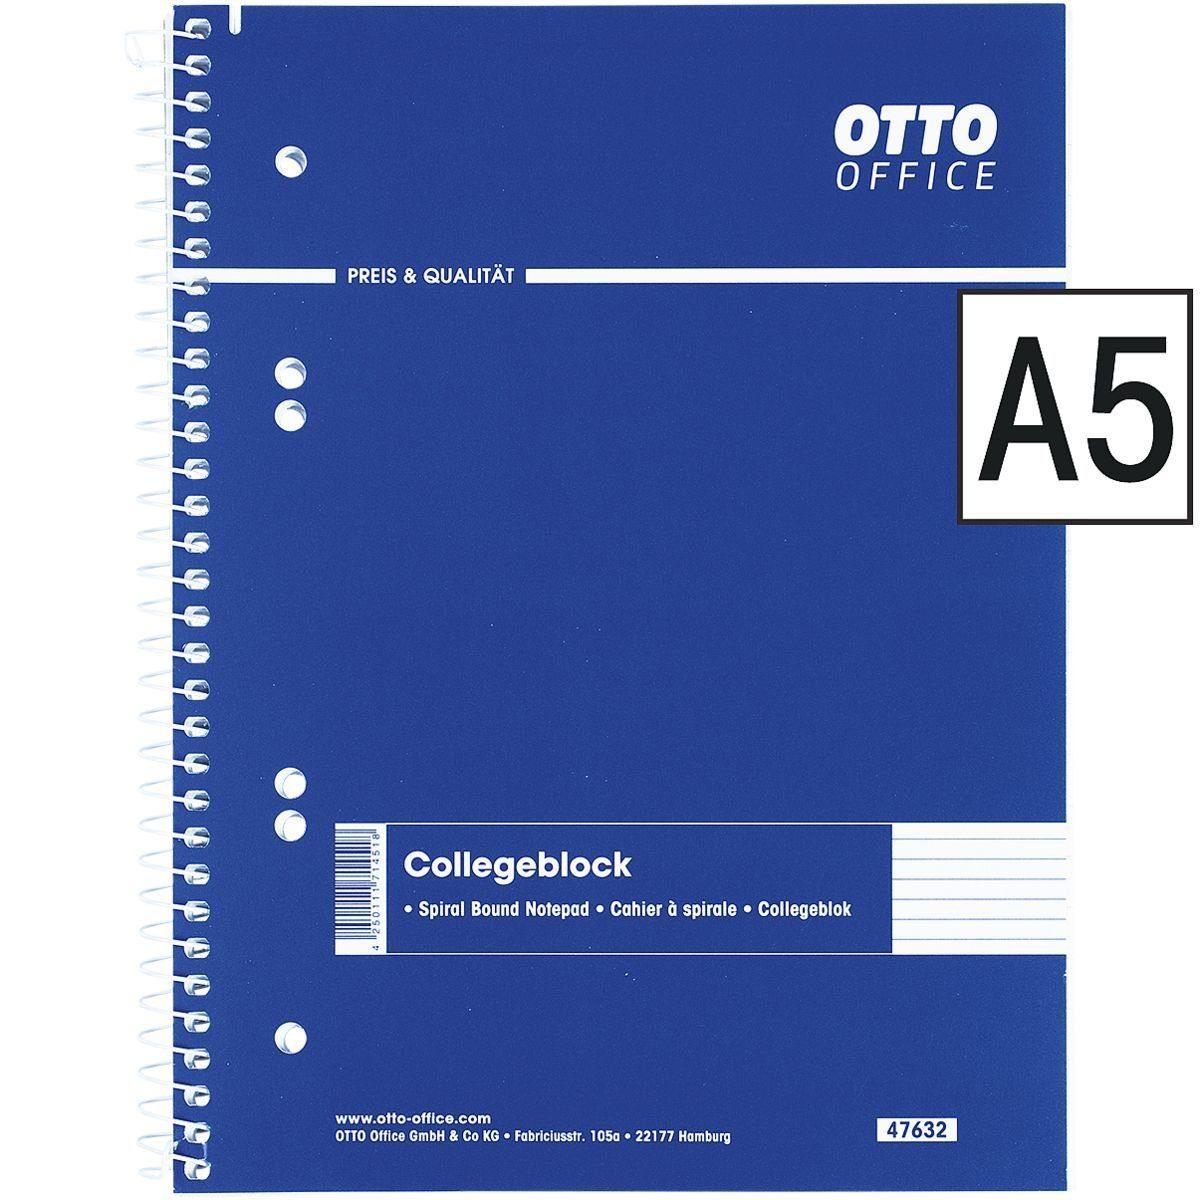 OTTO Office Standard Collegeblock